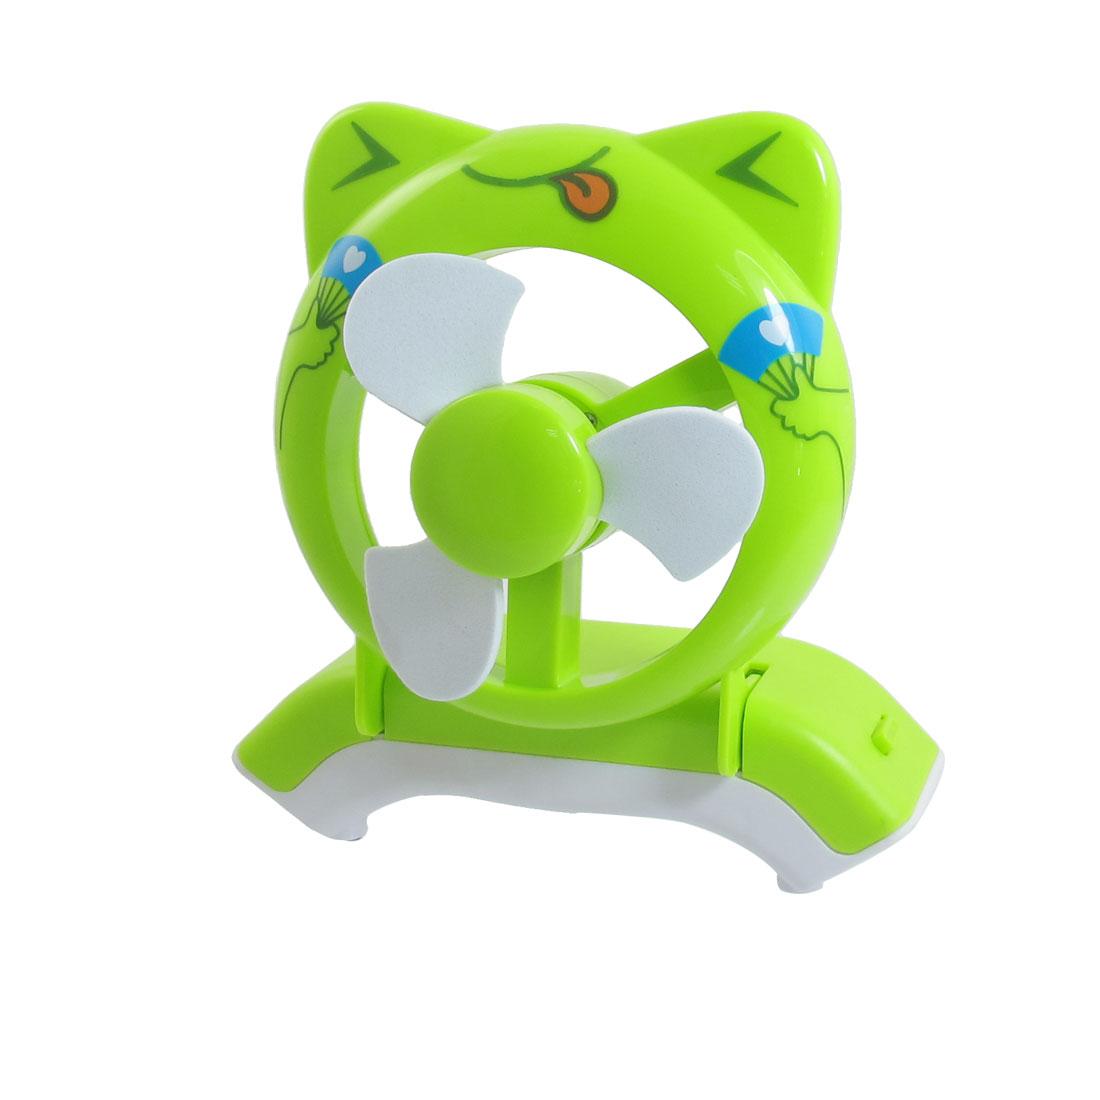 Cartoon Frog Design Portable Battery USB Power PC Laptop Cooler Mini Fan Green